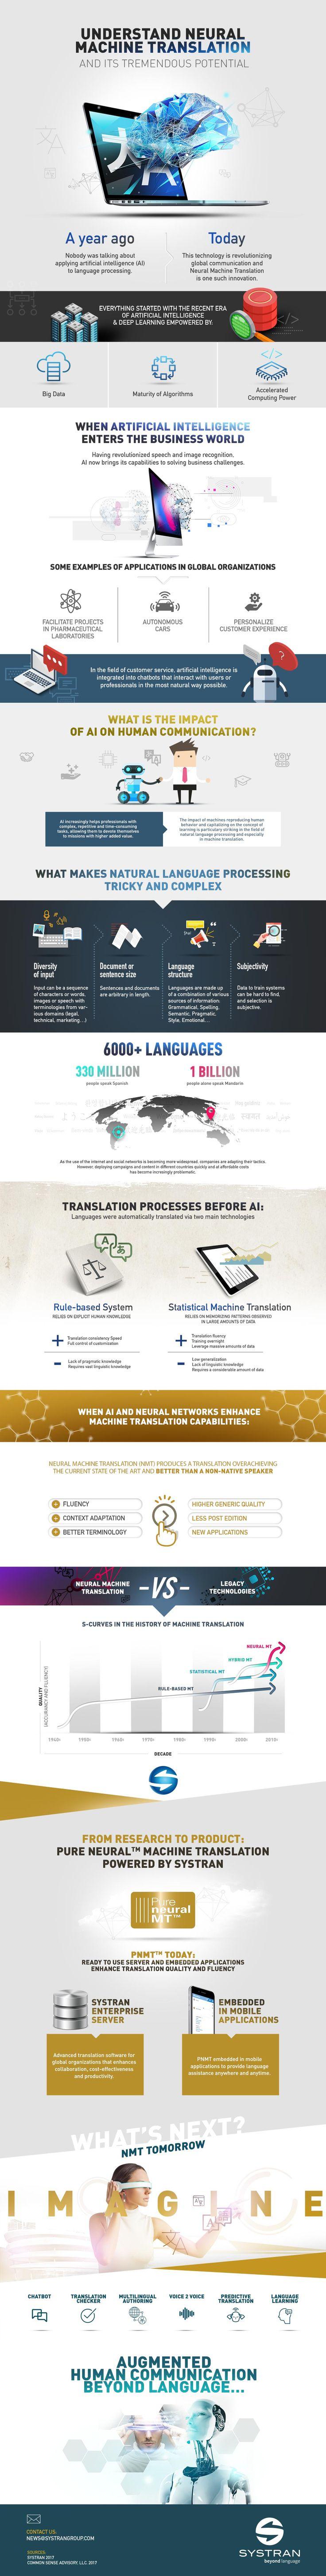 The white apron english translation - Understand Neural Machine Translation